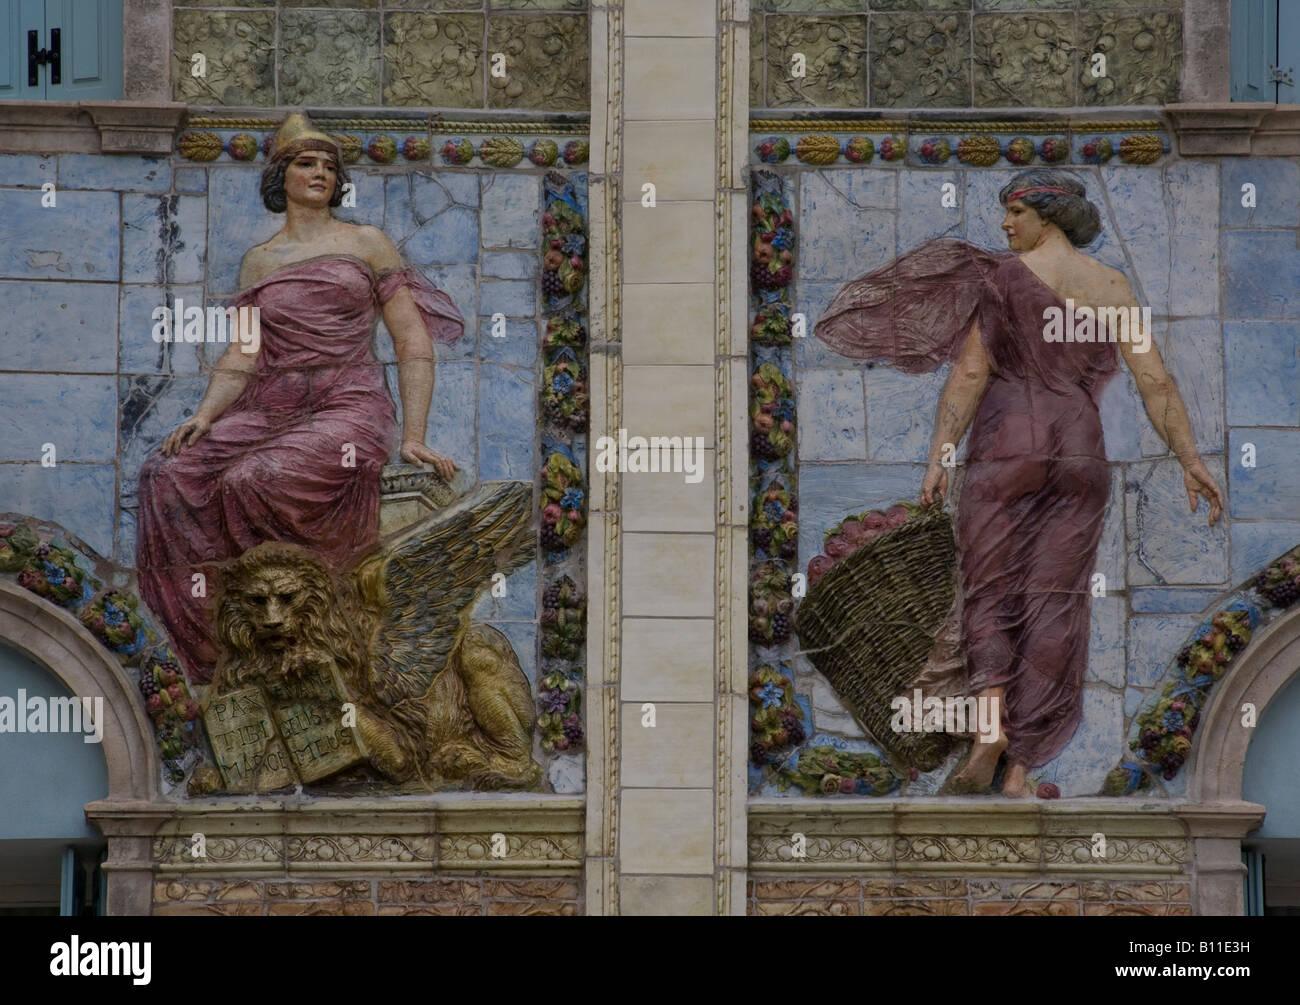 Venedig, Lido, Ausonia Palace Hotel, Fassadendetail - Stock Image